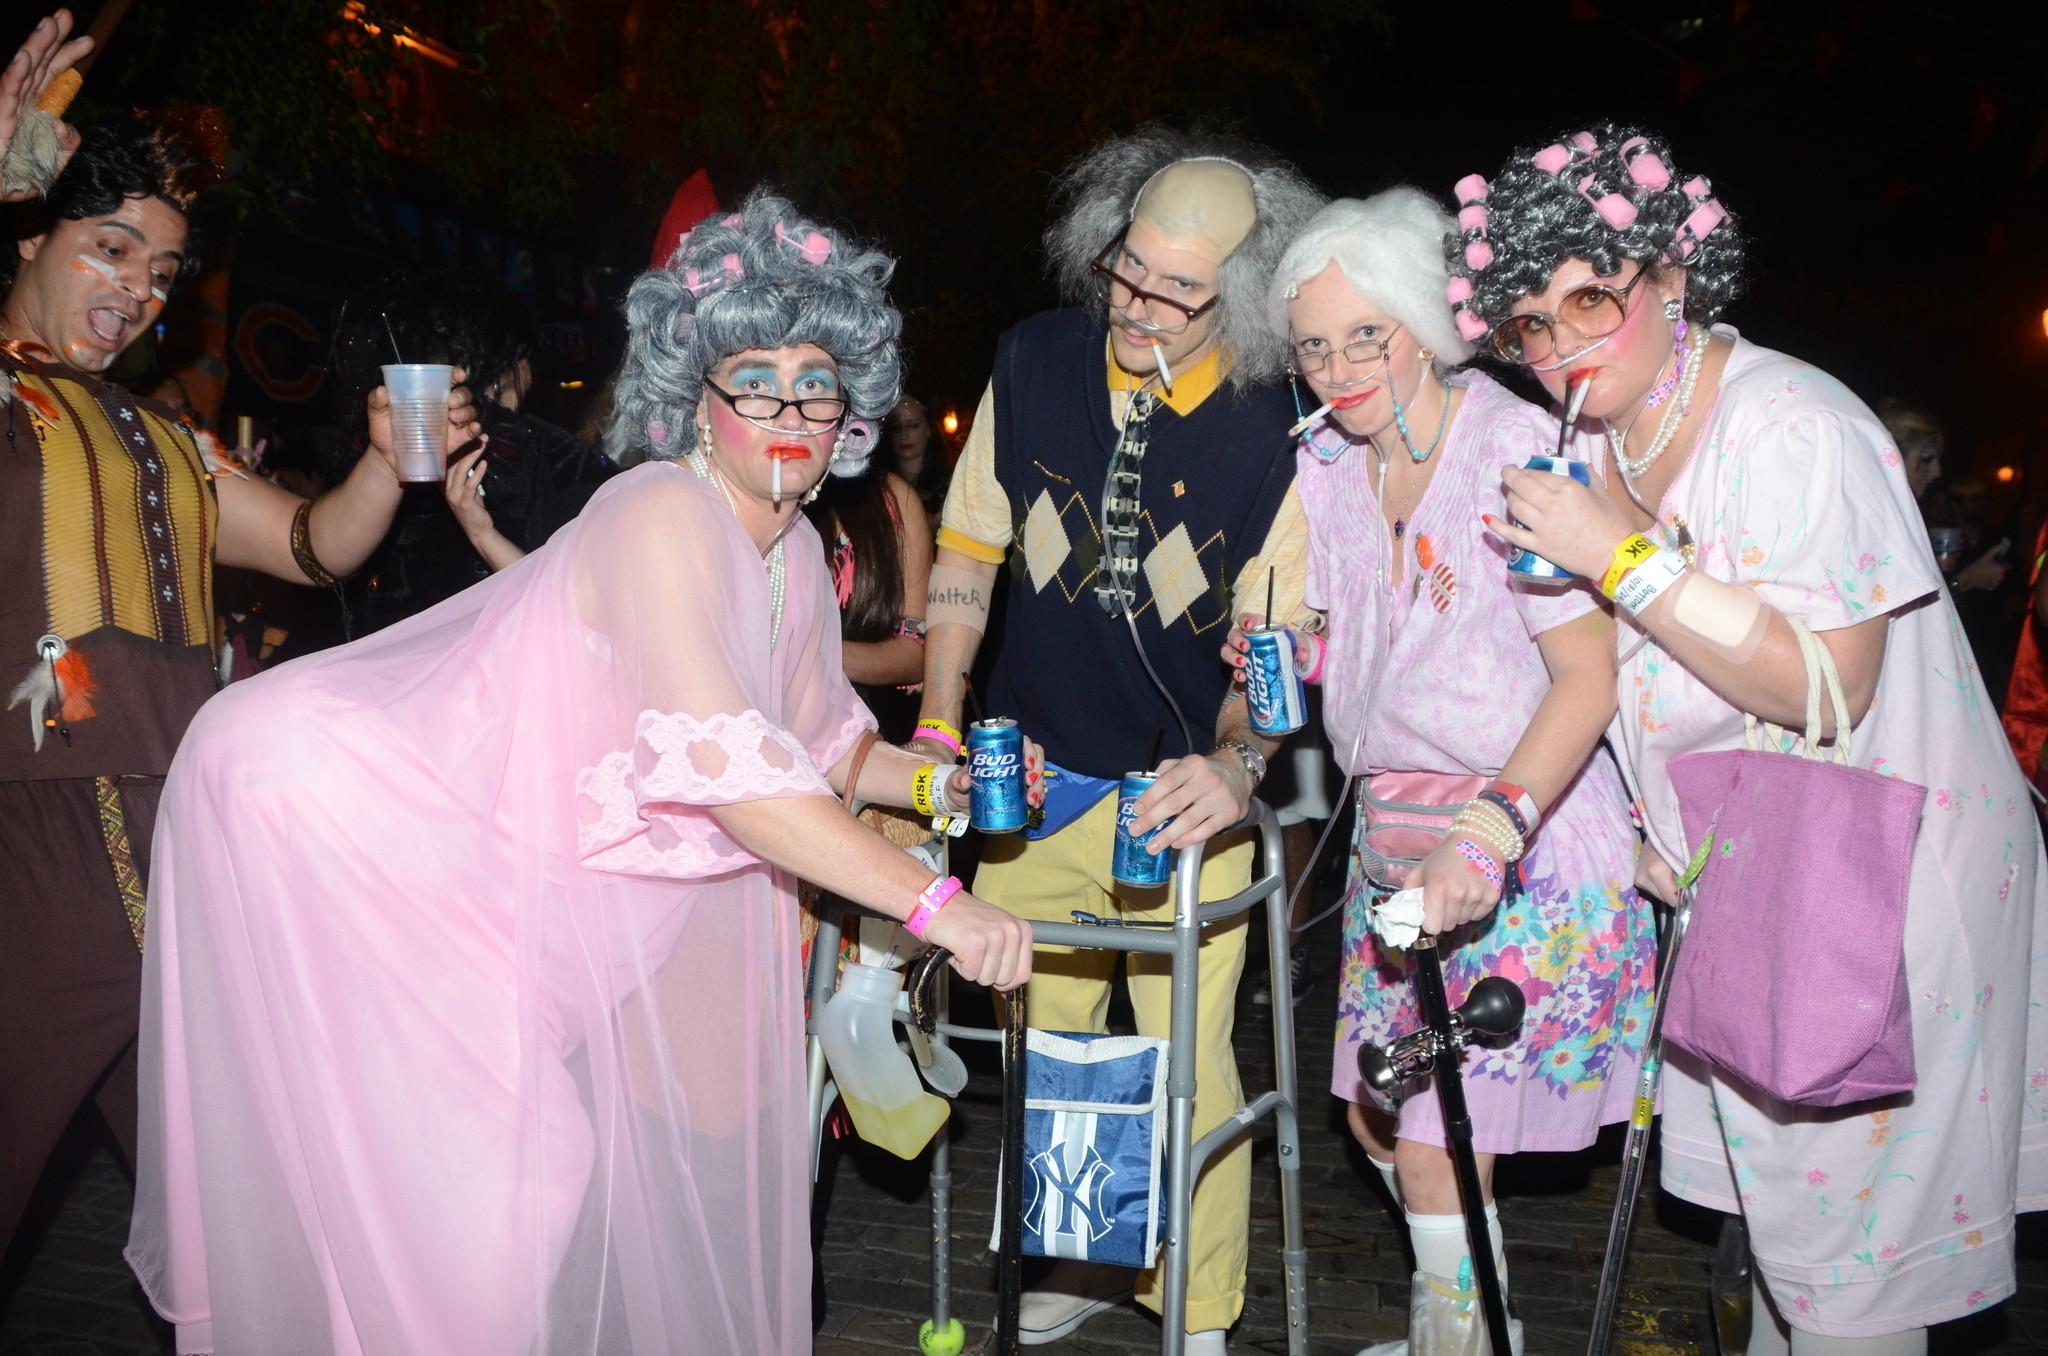 Pictures: Halloween parties in Orlando - Orlando Sentinel